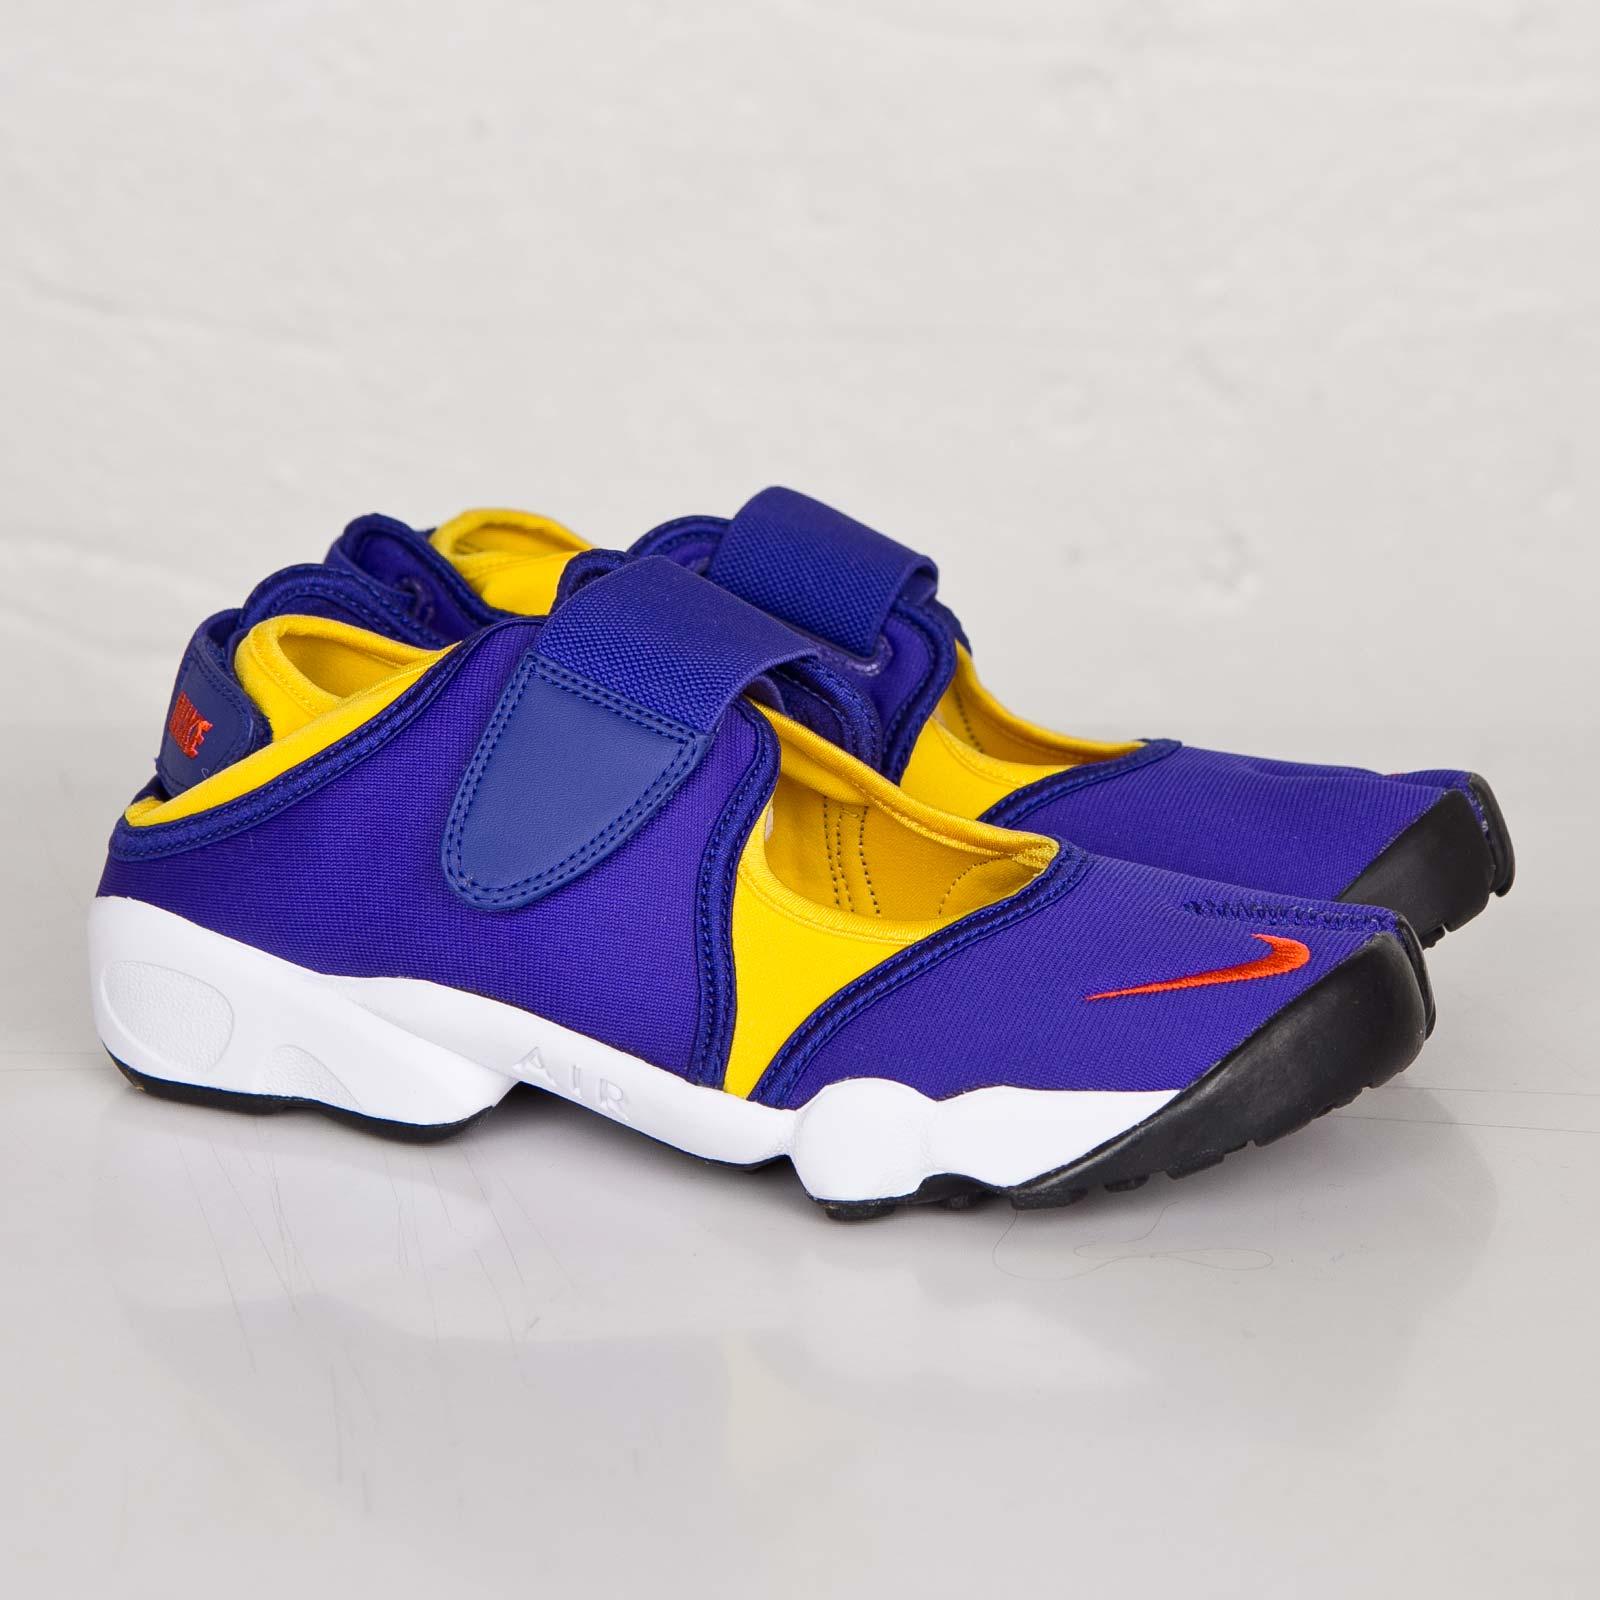 Nike Air Rift QS - 789491-481 - Sneakersnstuff  67fb34654